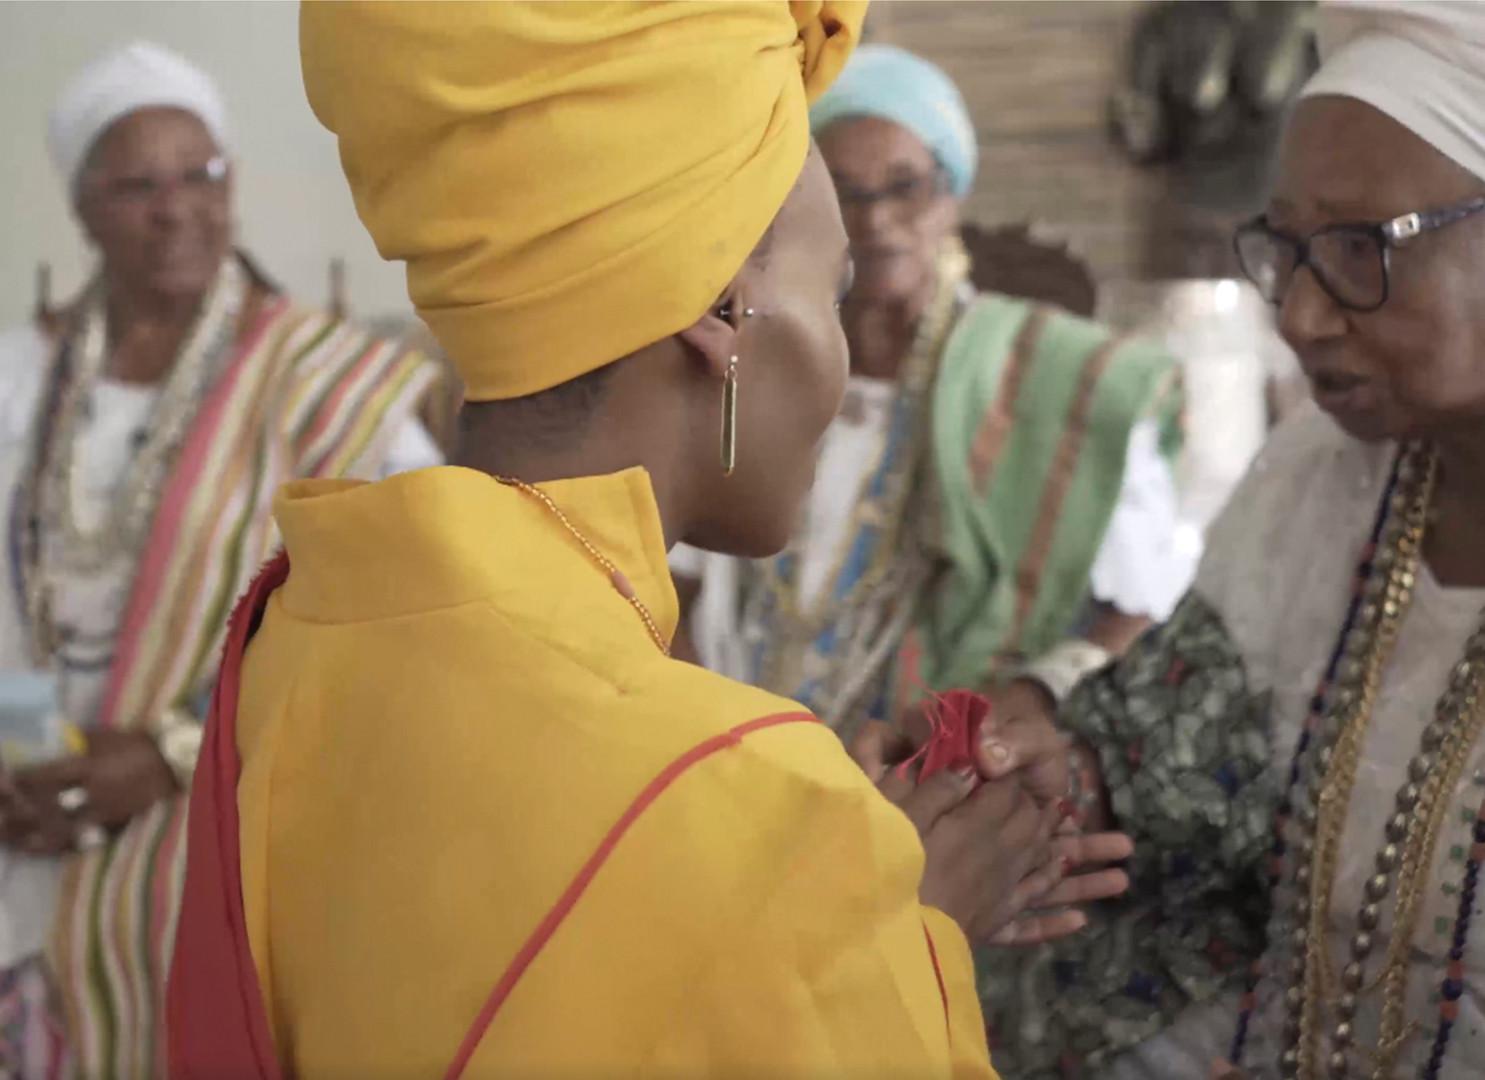 Lhola Amira | IRMANDADE: The Shape of Water in Pindorama | 2018-2020 | Video HD, Single Channel Sound | 00:16:13 | Film Still